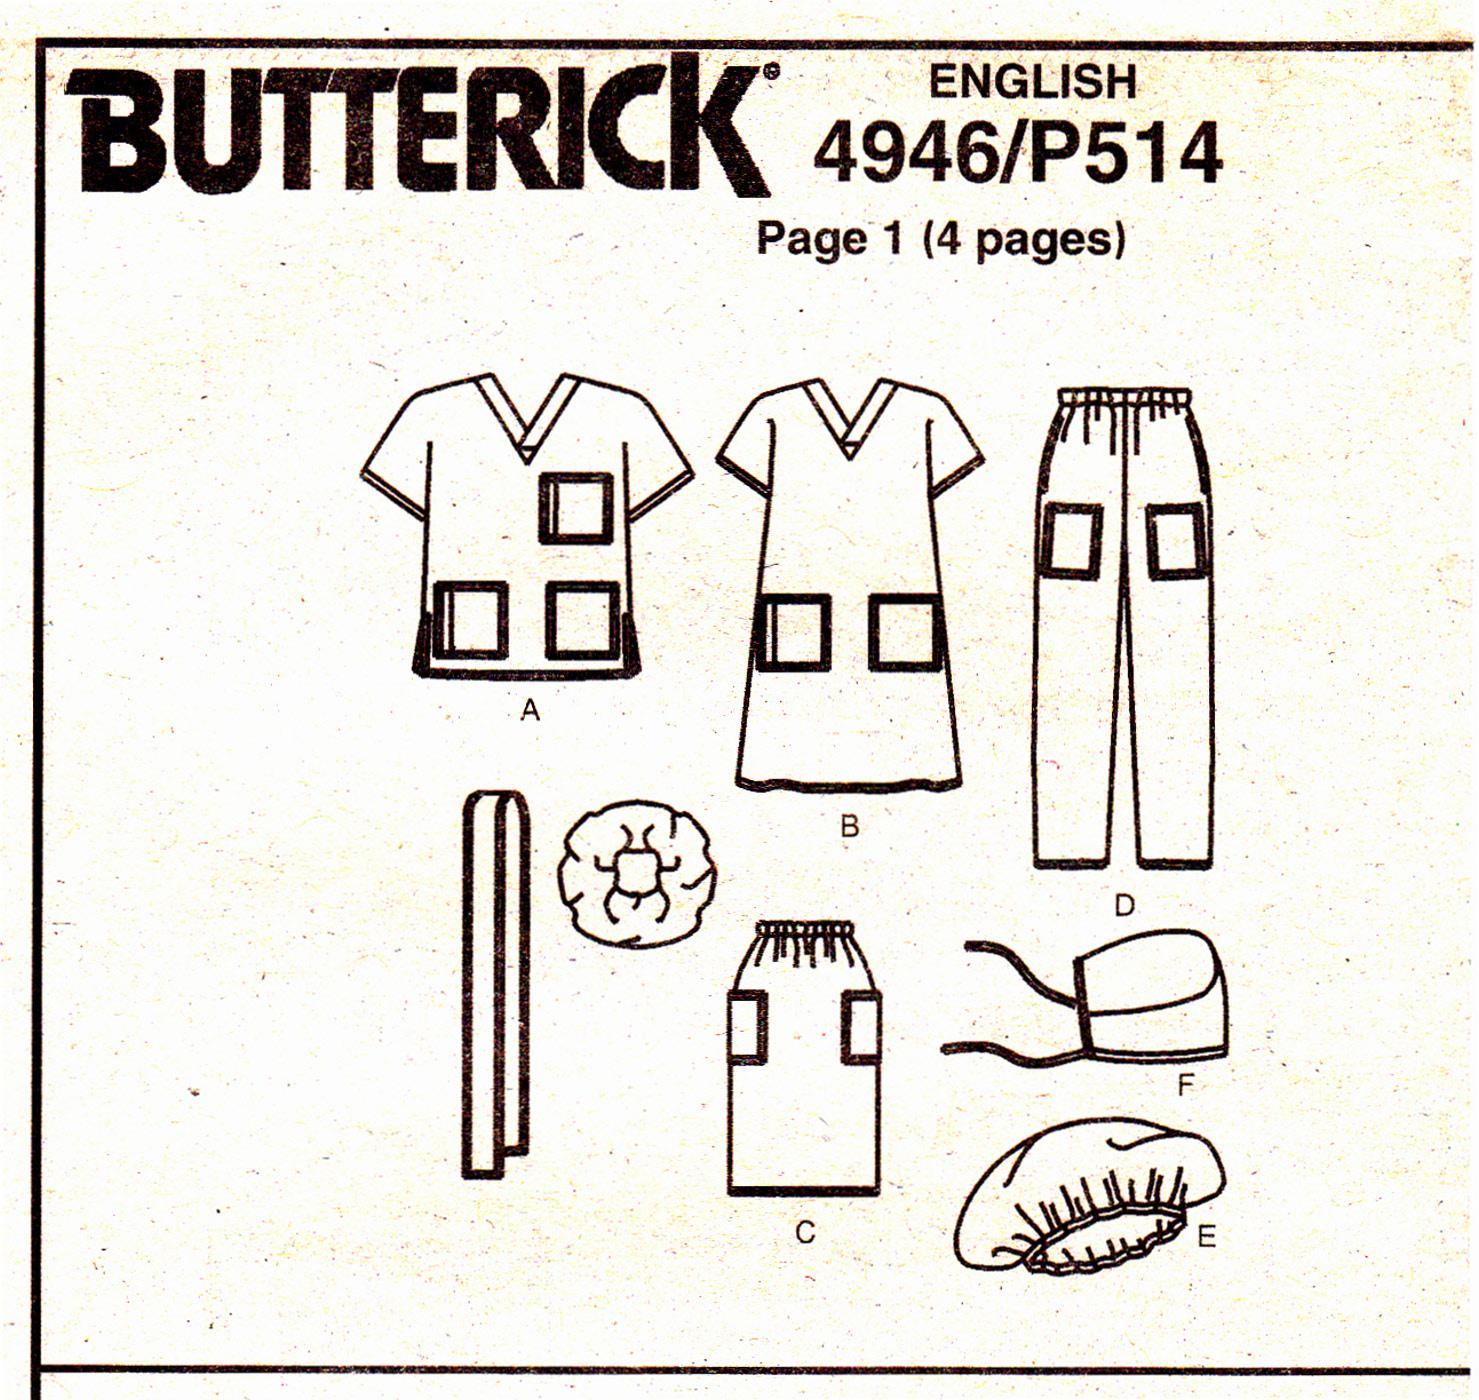 Butterick 4946 Scrubs Uniforms Unisex Sewing Pattern Dress Pants Top Sizes L-XL